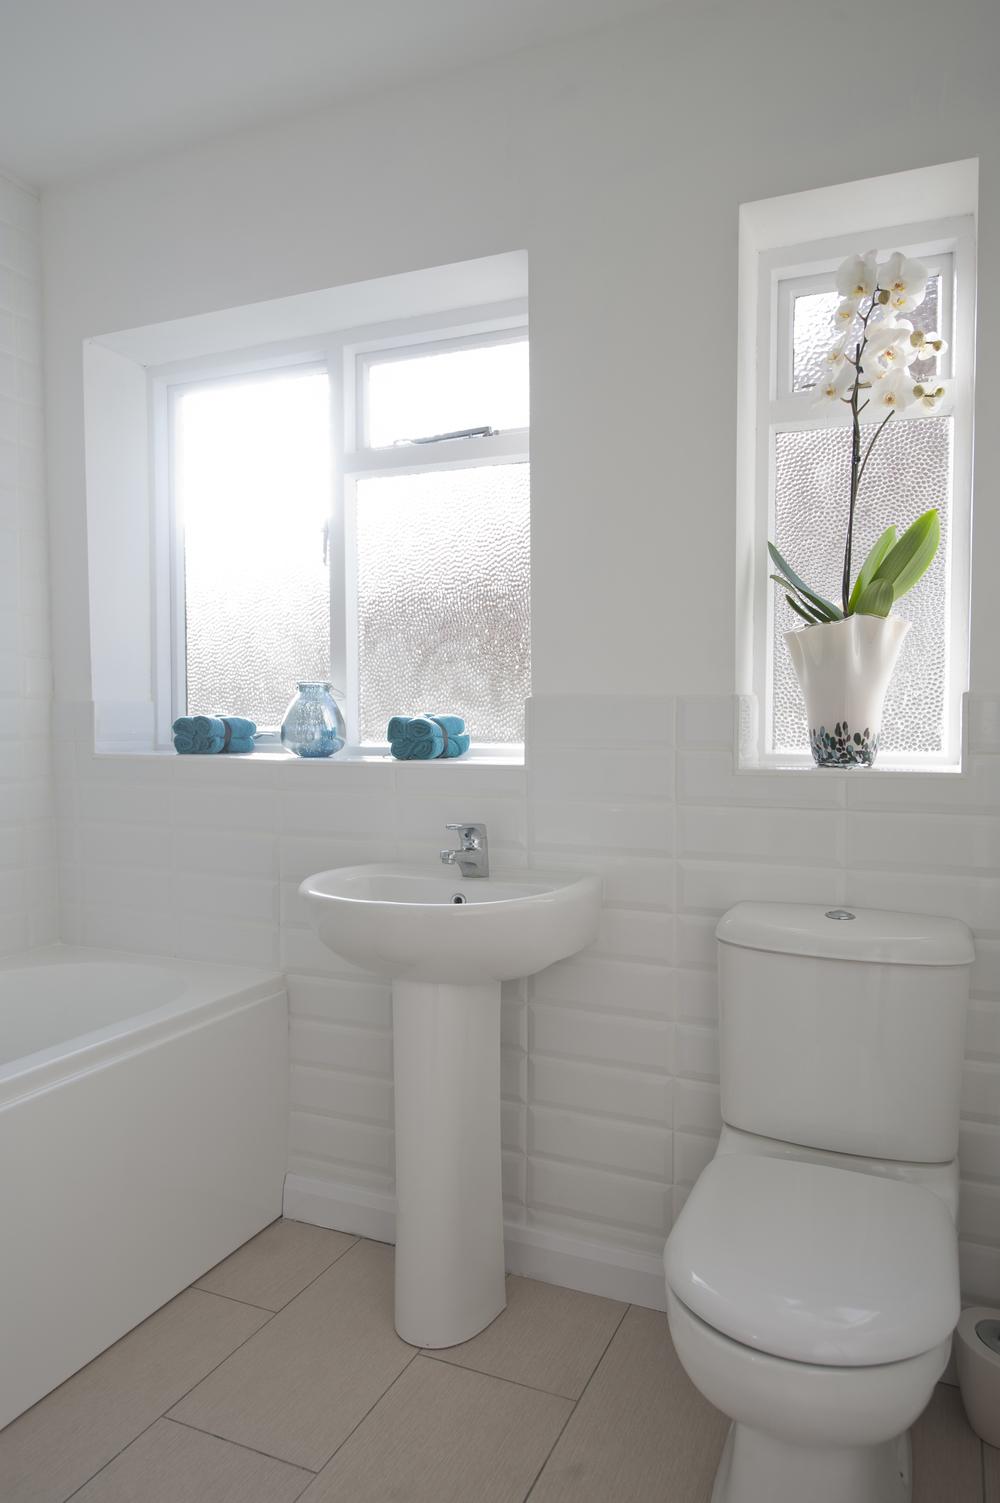 Tunbridge Wells Bungalow Renovation by Smartstyle Interiors Bathroom 2.jpg